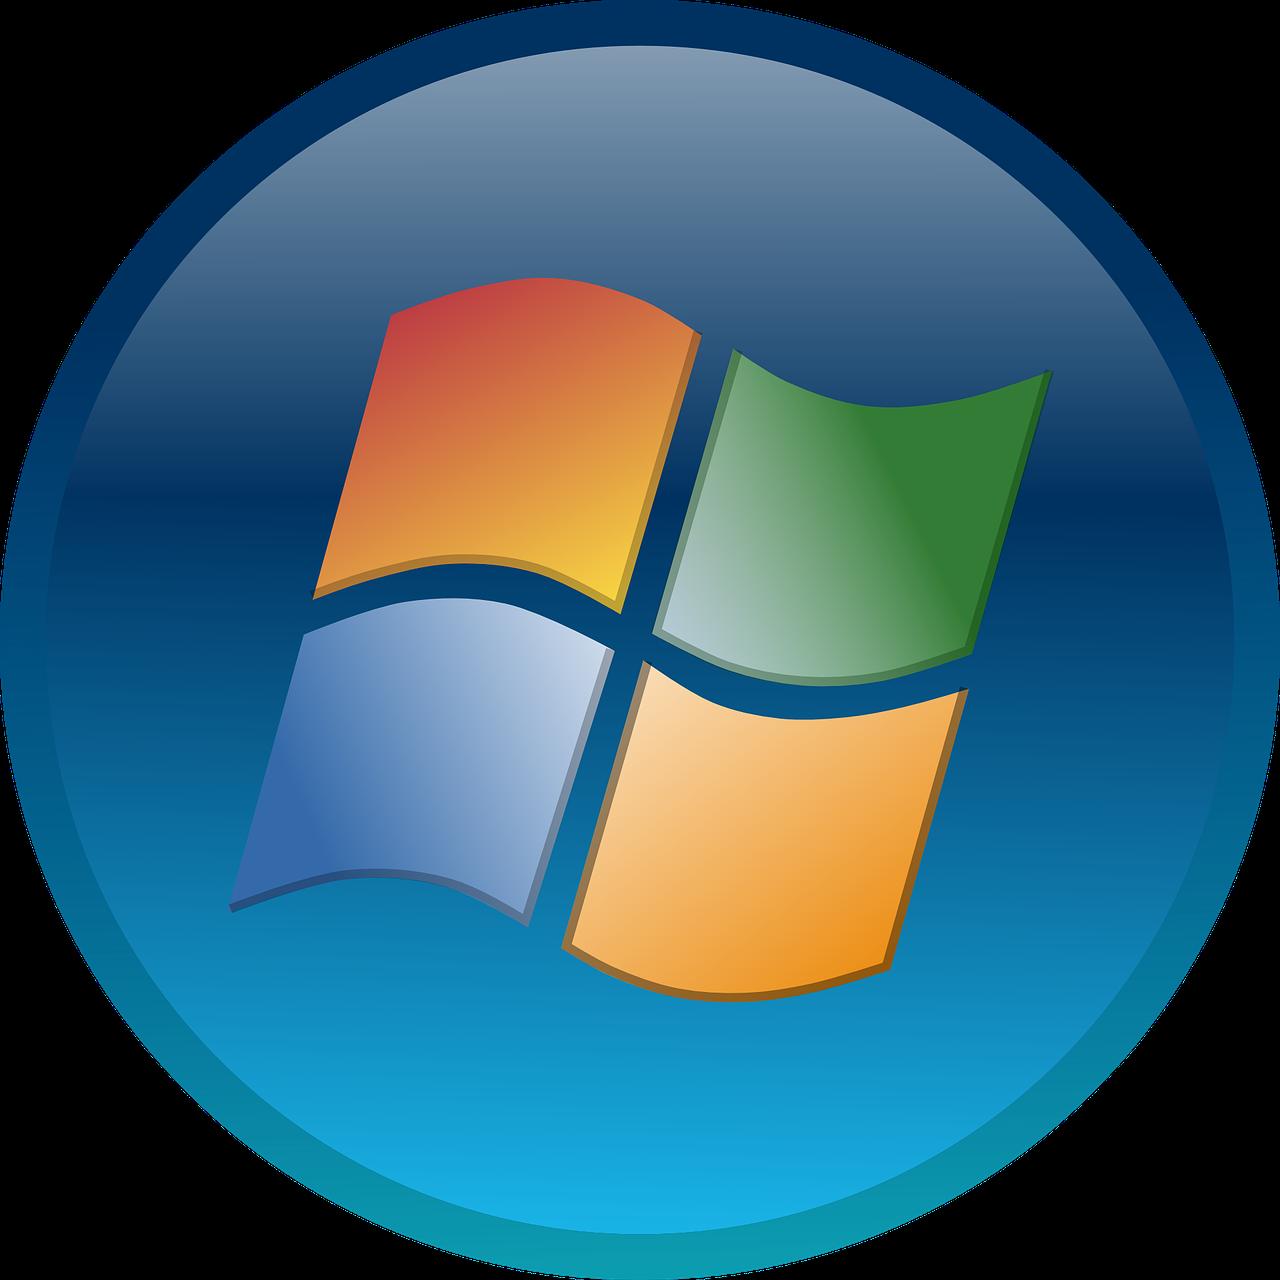 Add a Start Menu to Windows 8 (or 8.1) ~ Cool Geek Tricks